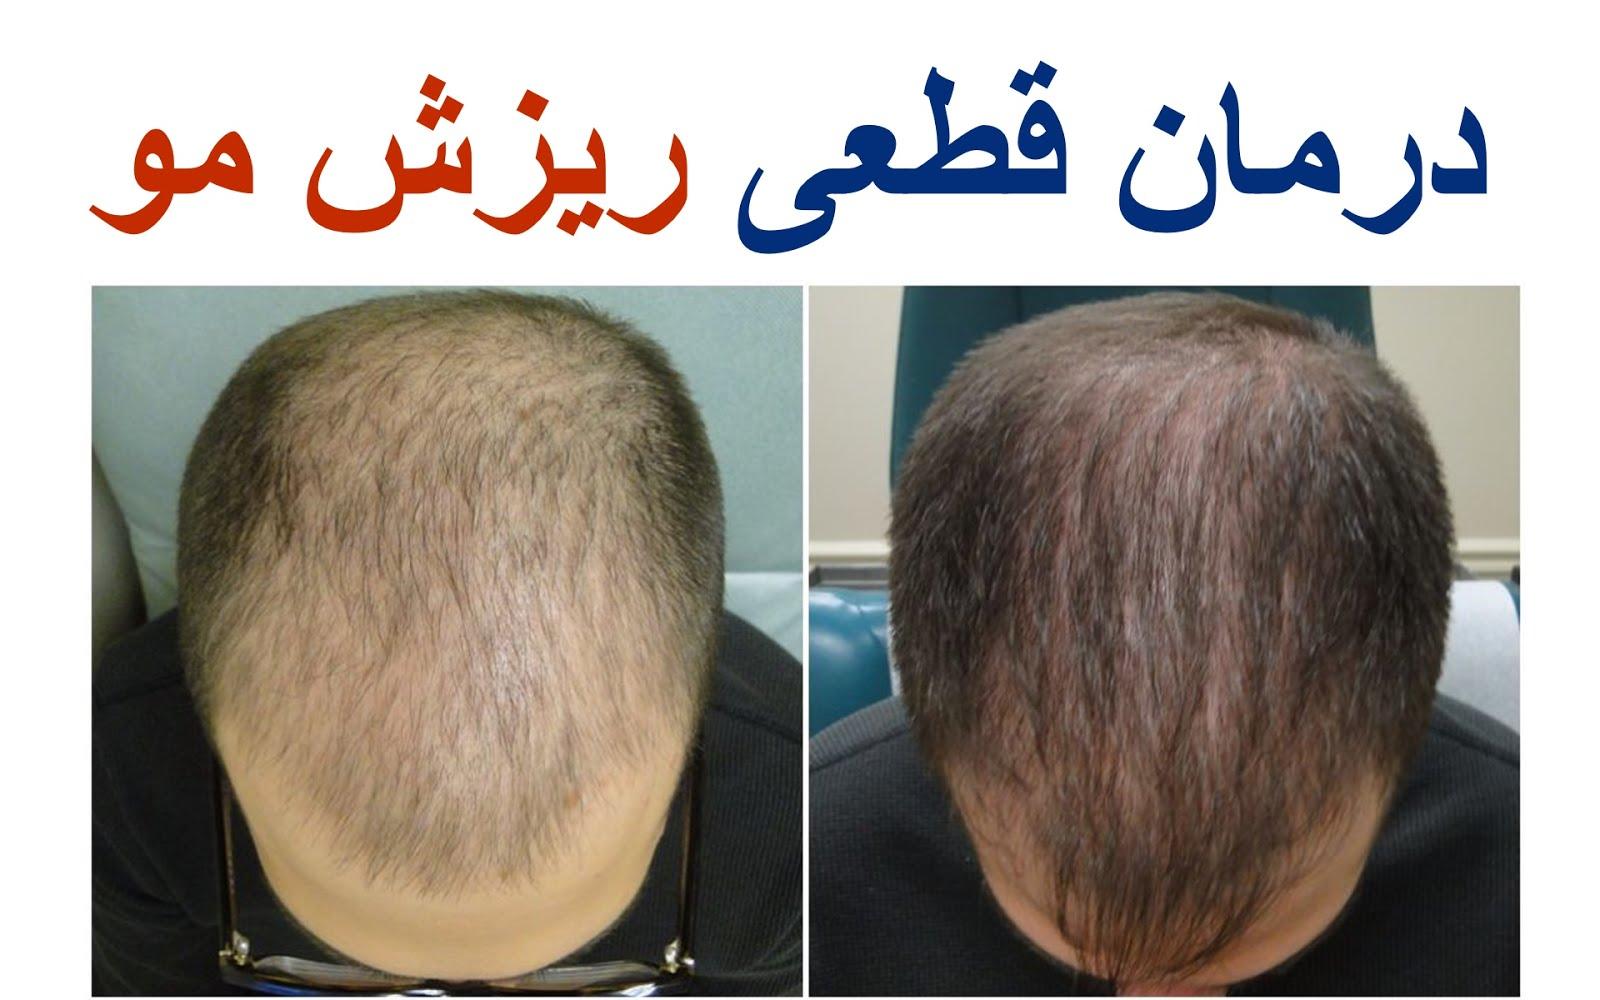 Pezeshke Bartar پزشک برتر: best hair loss treatment